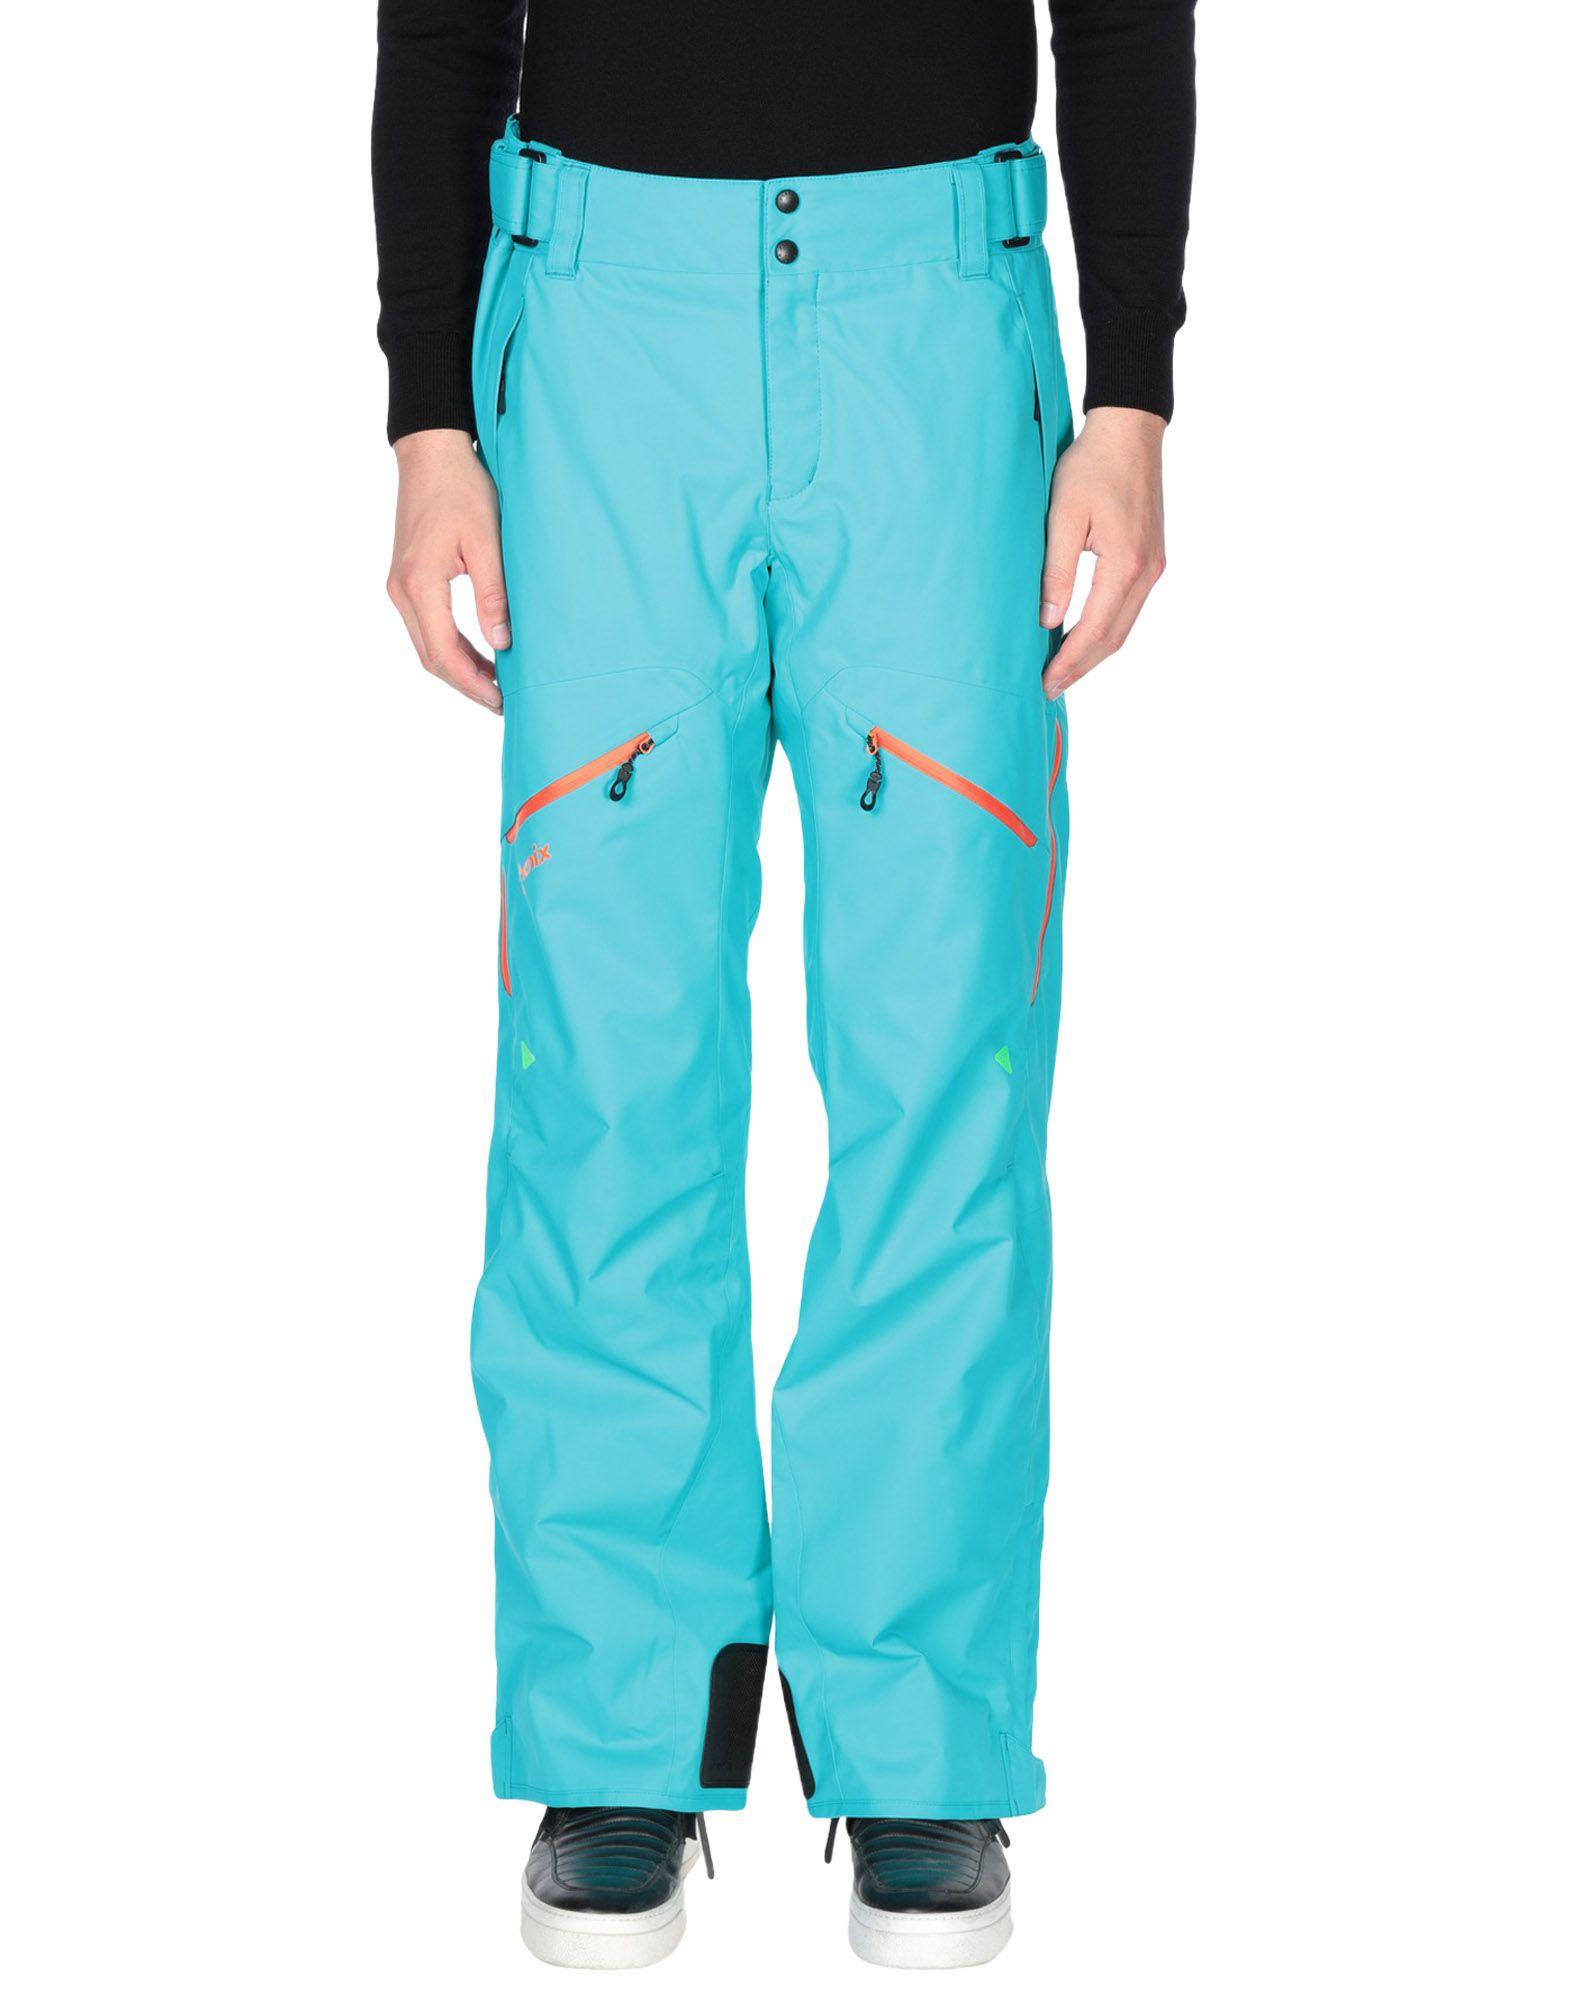 PHENIX Ski Pants in Turquoise